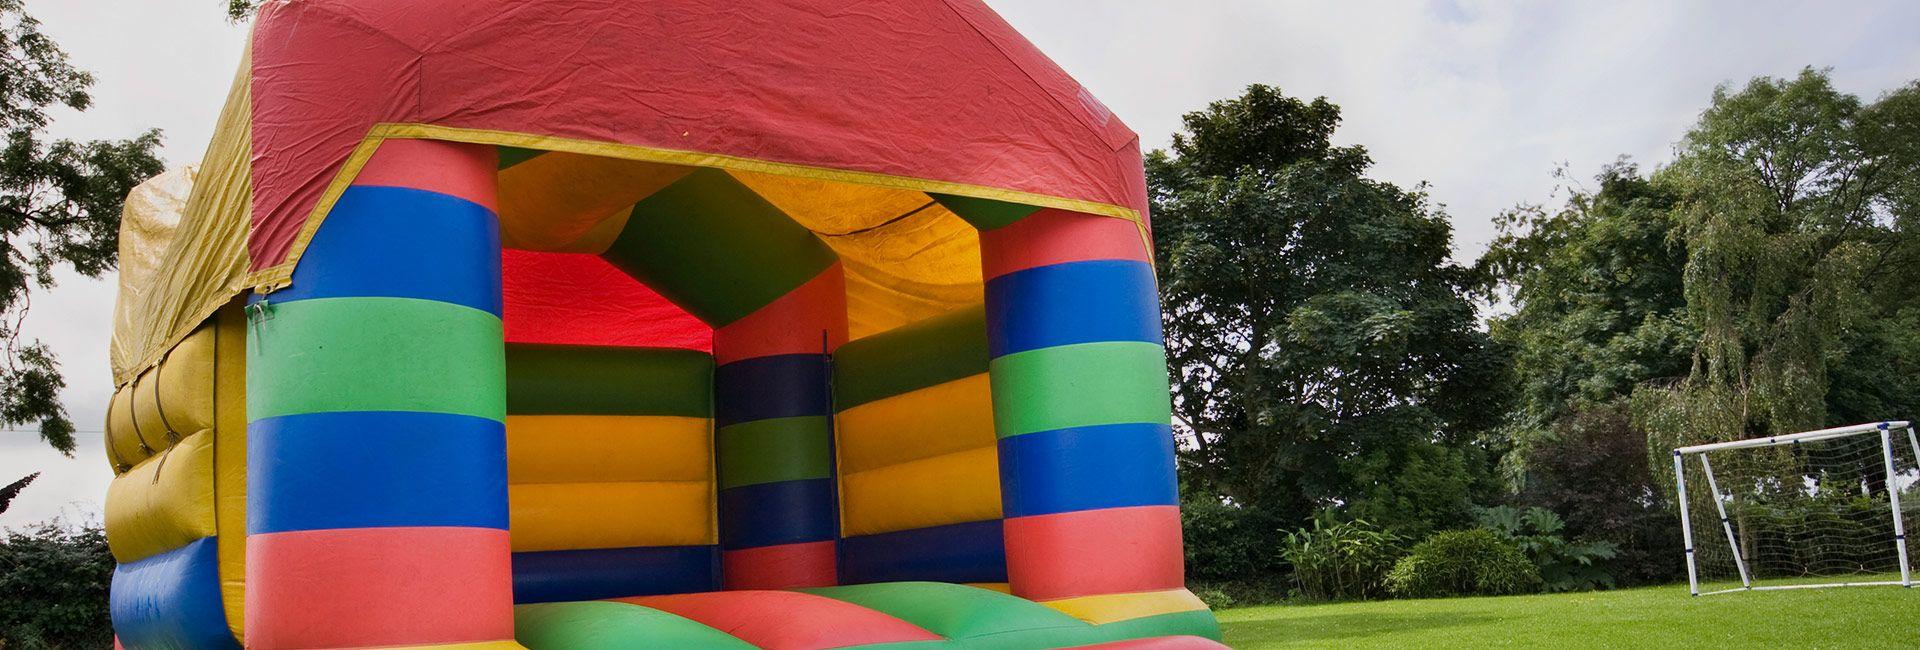 bouncy castles family fun days